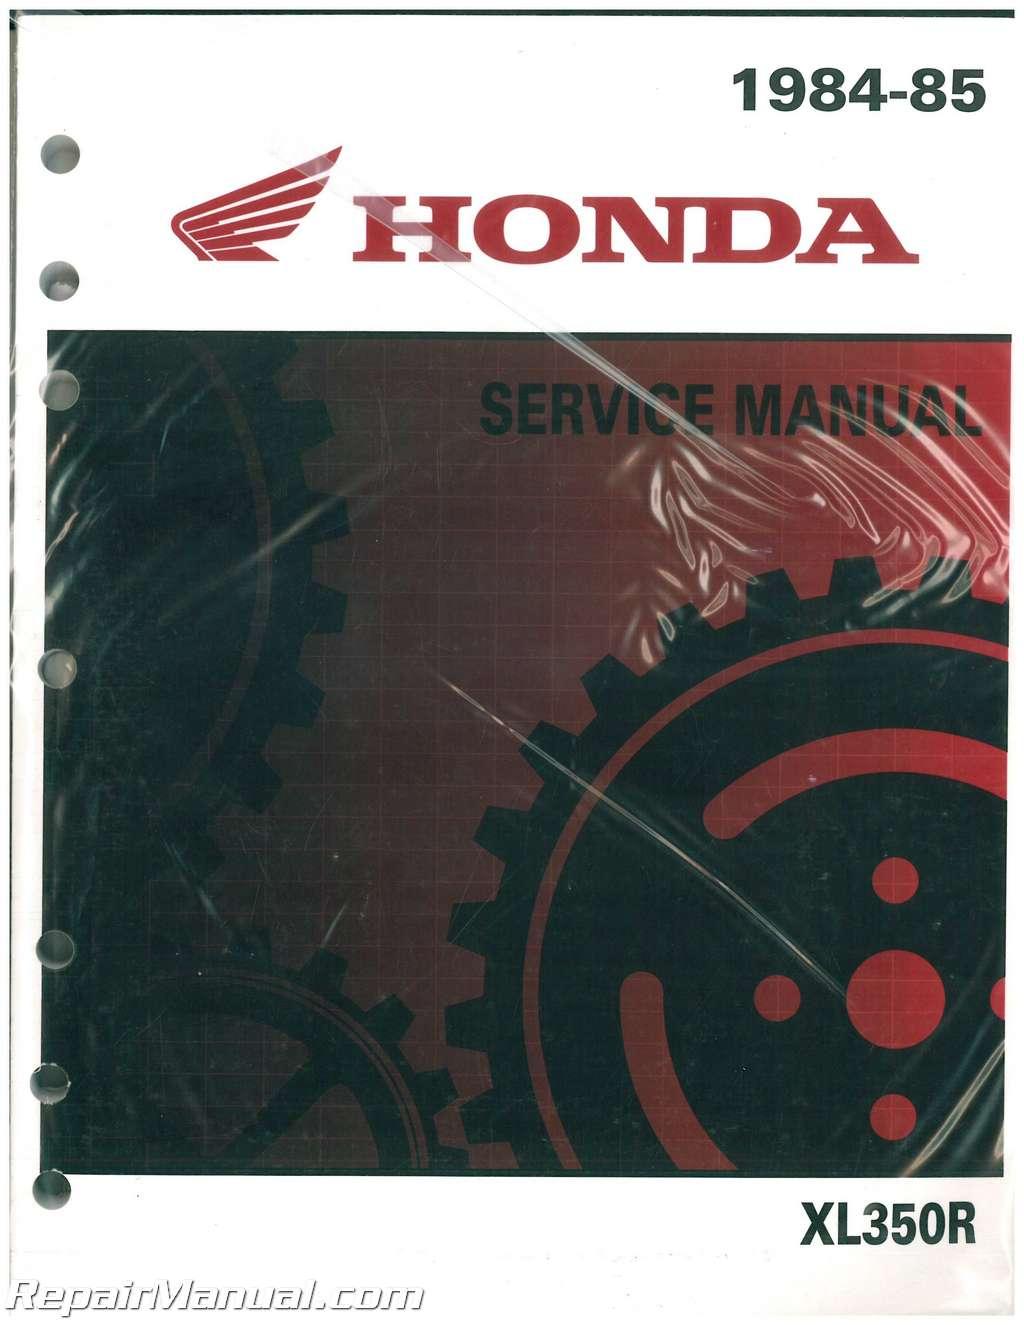 1984 honda xl350r service manual